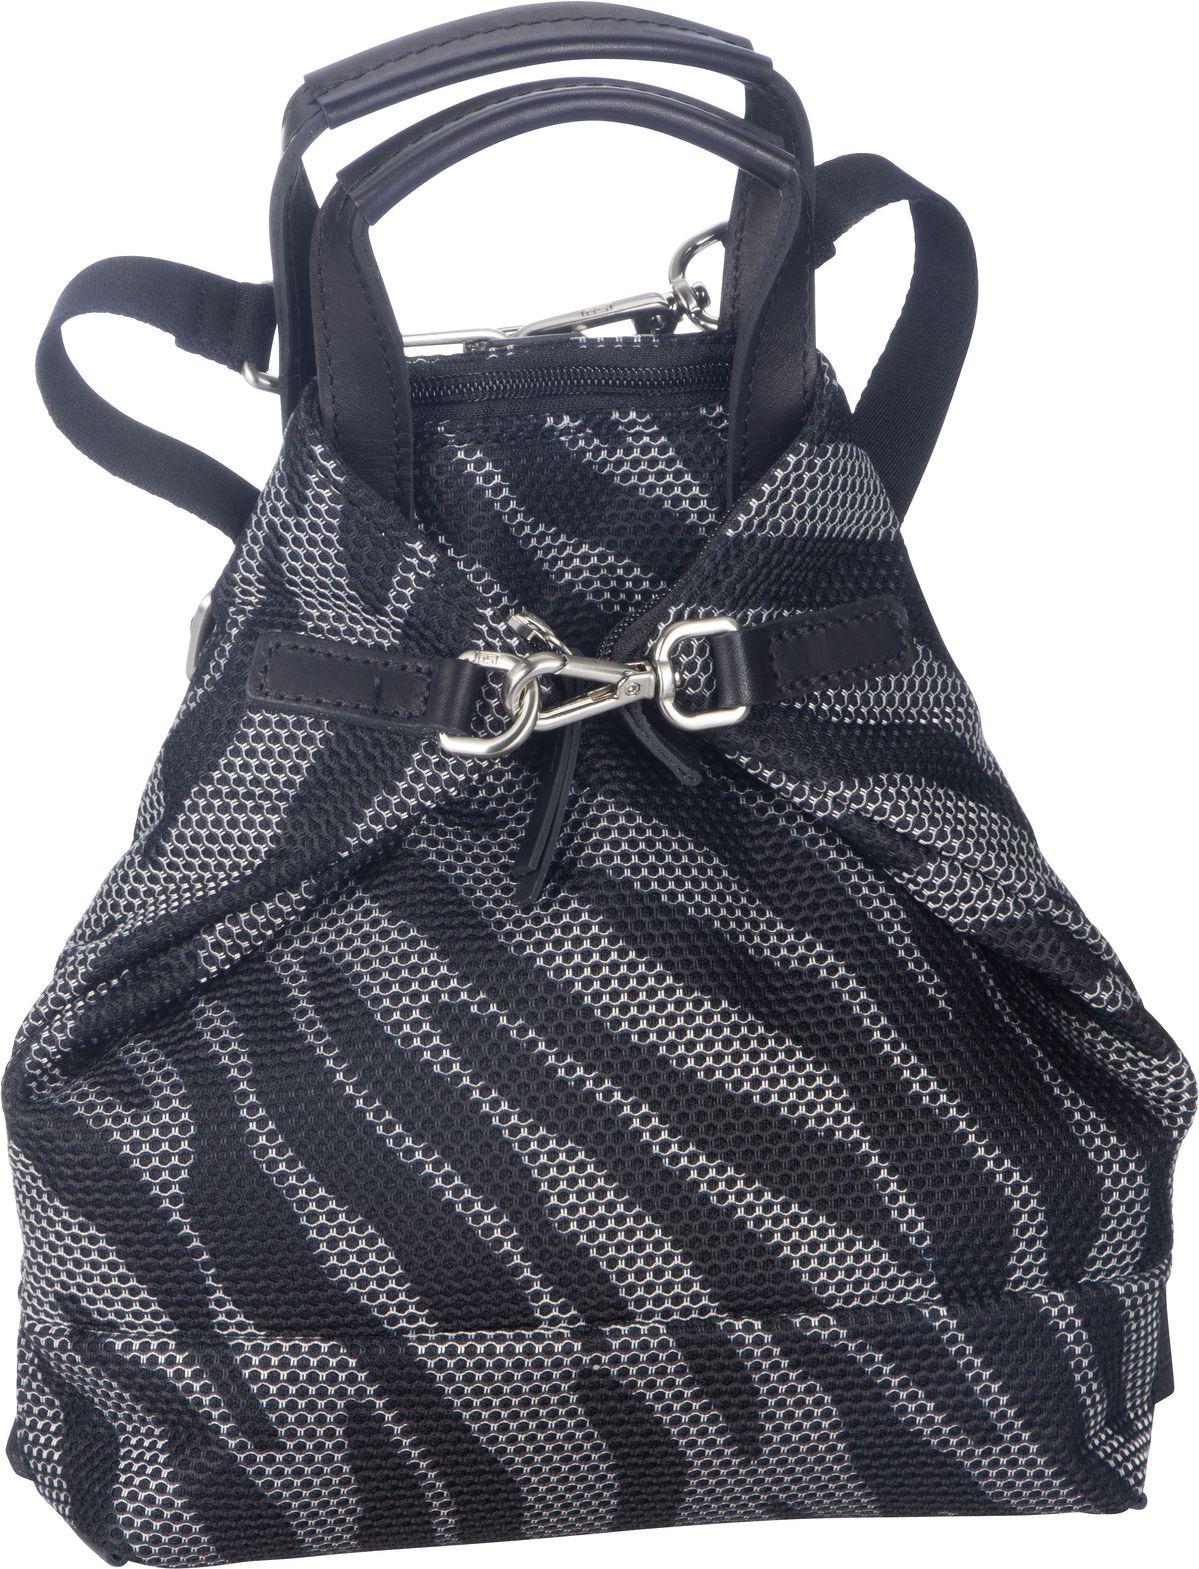 Rucksack / Daypack Mesh 6176 X-Change Bag Mini Zebra